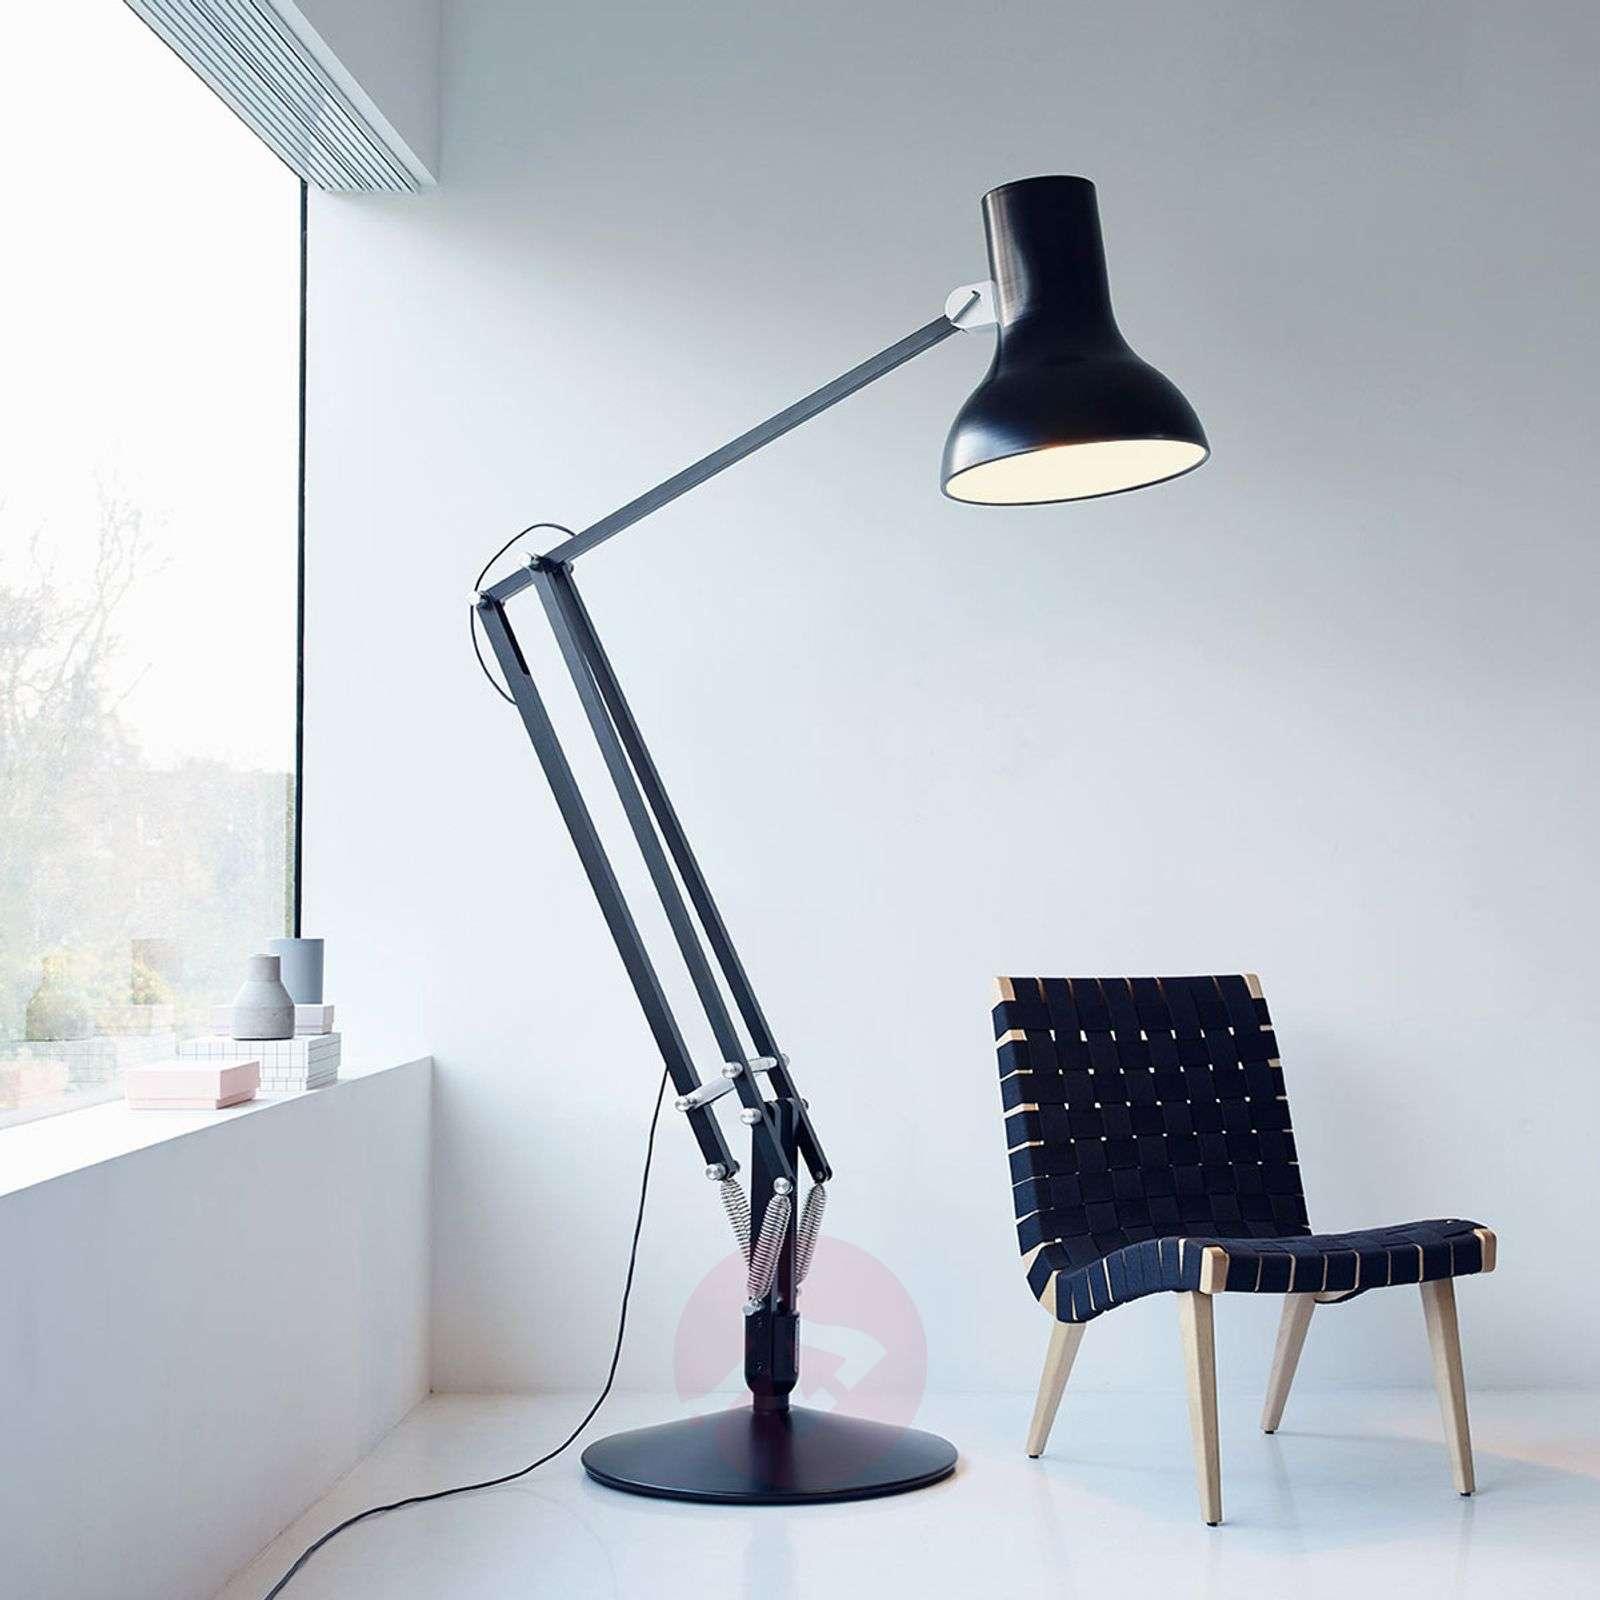 Anglepoise Type 75 Giant floor lamp-1073063X-01